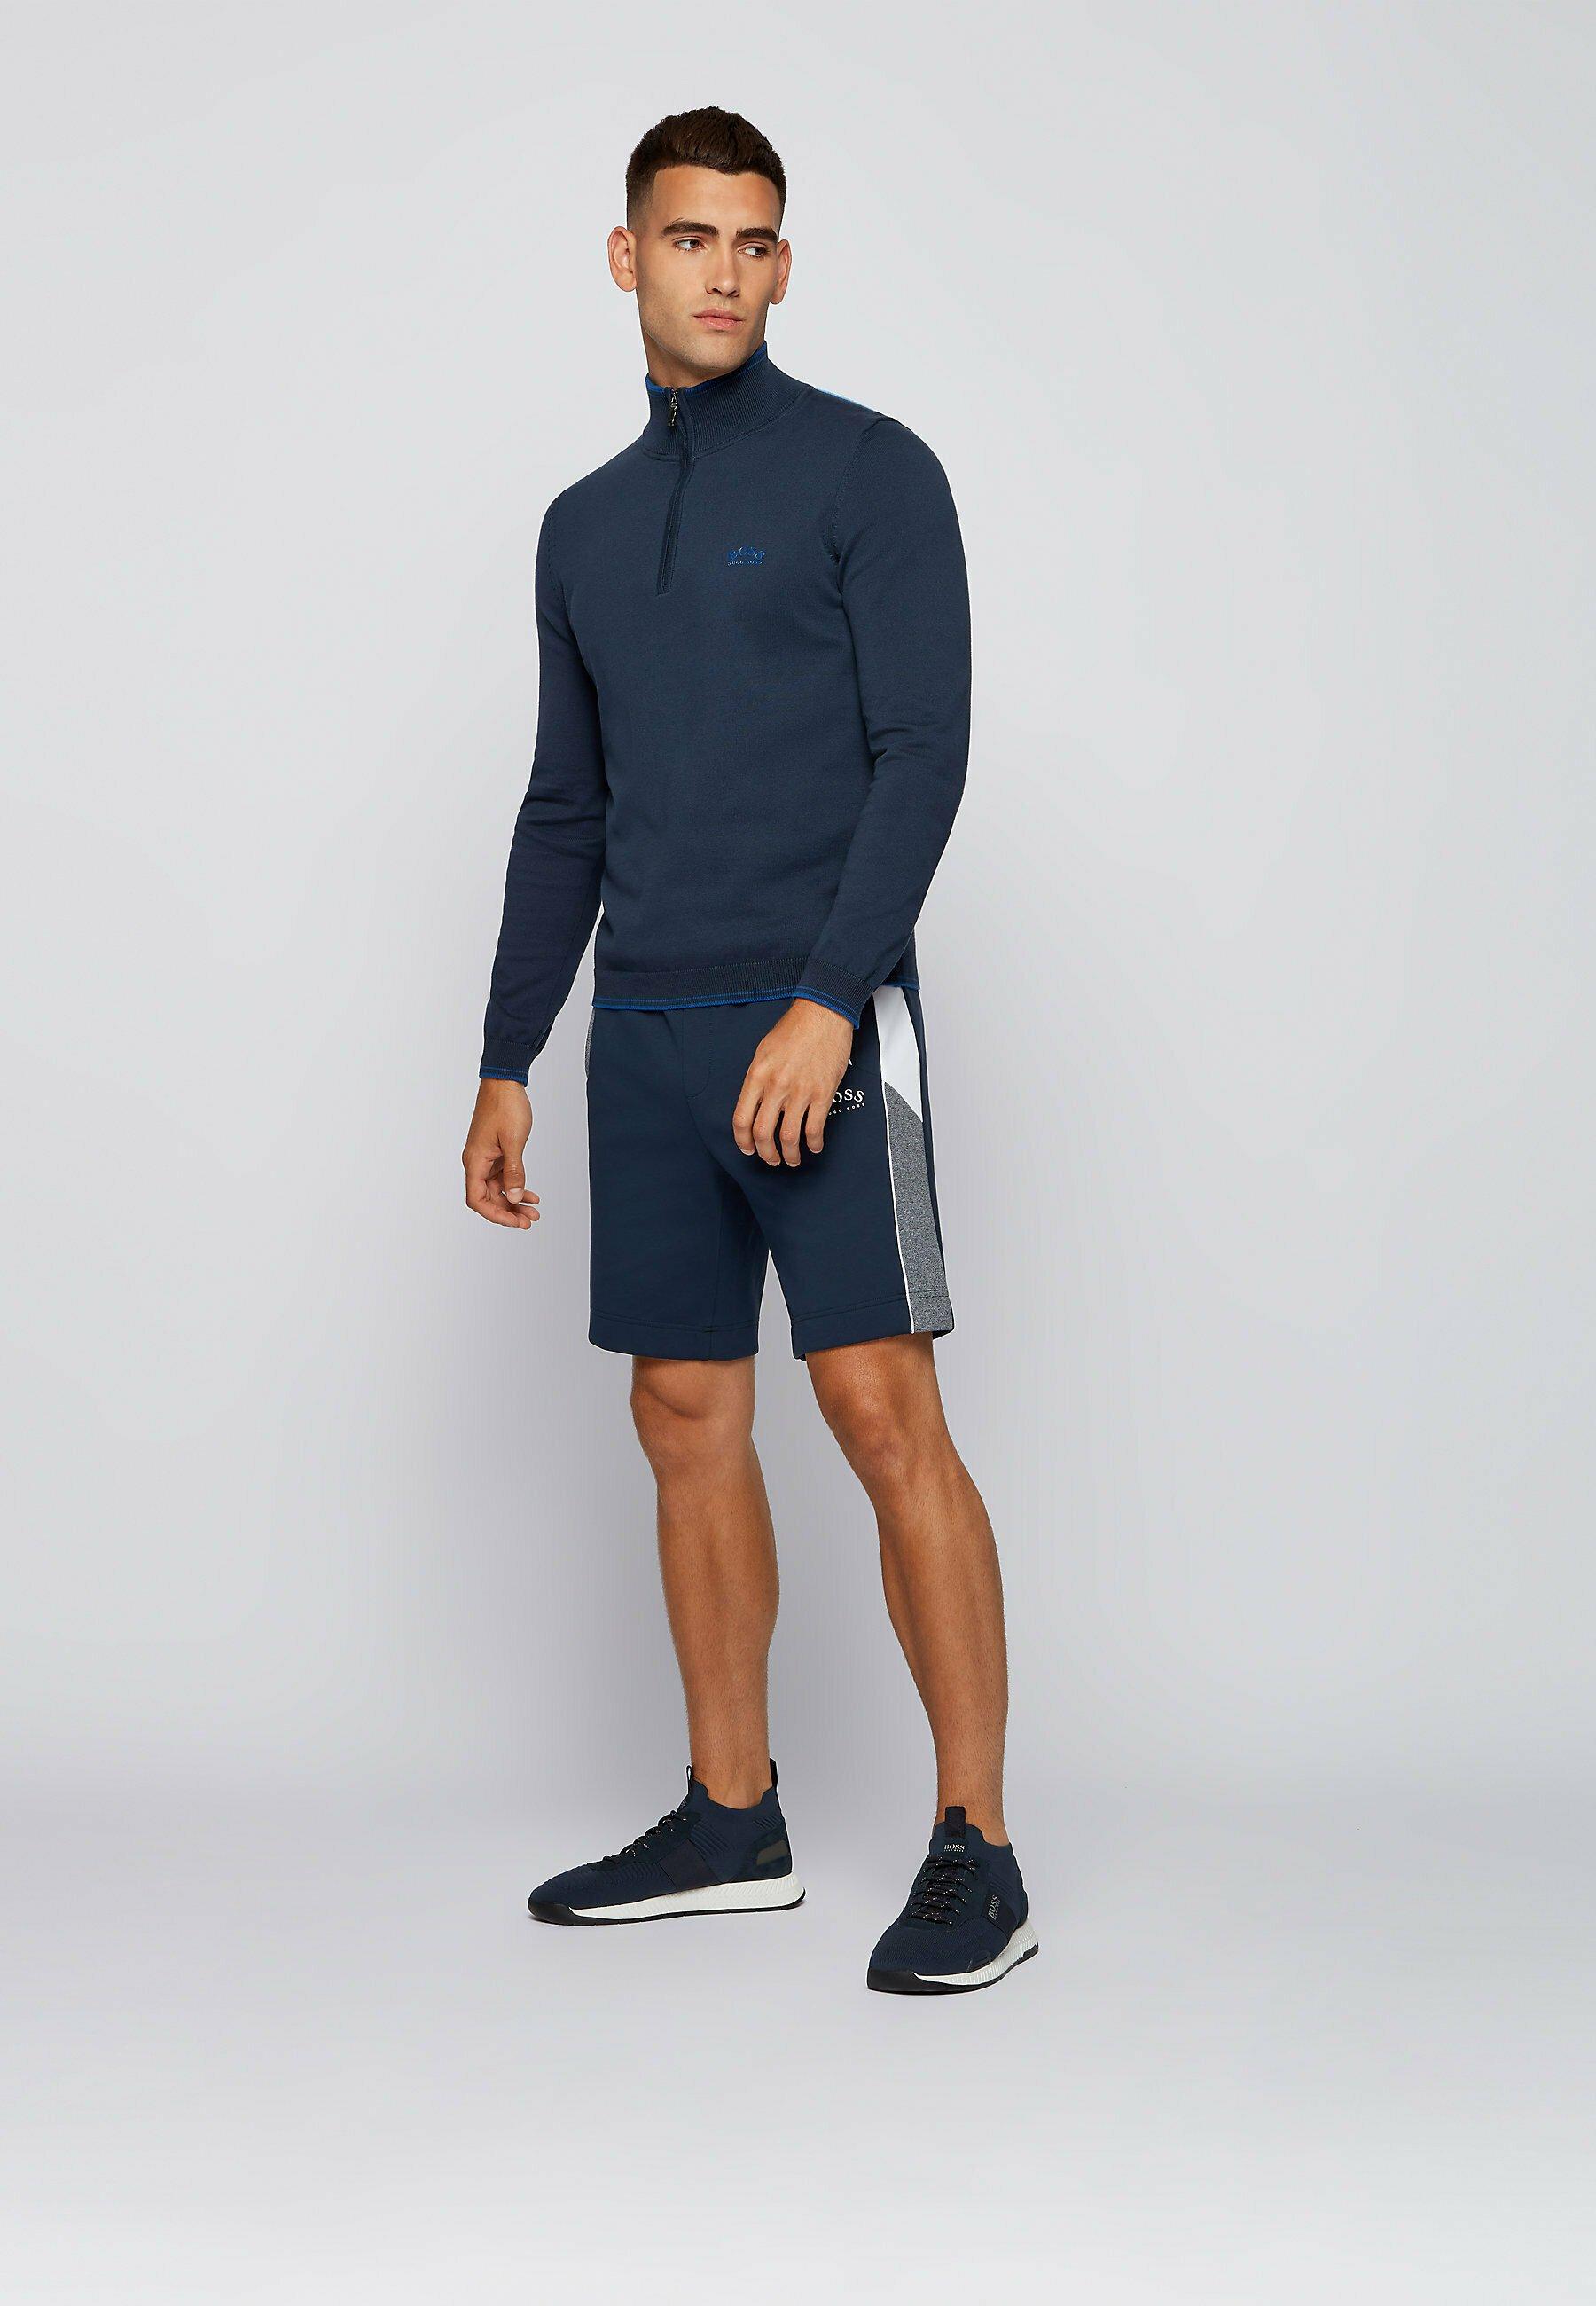 Homme ZITOM - Pullover